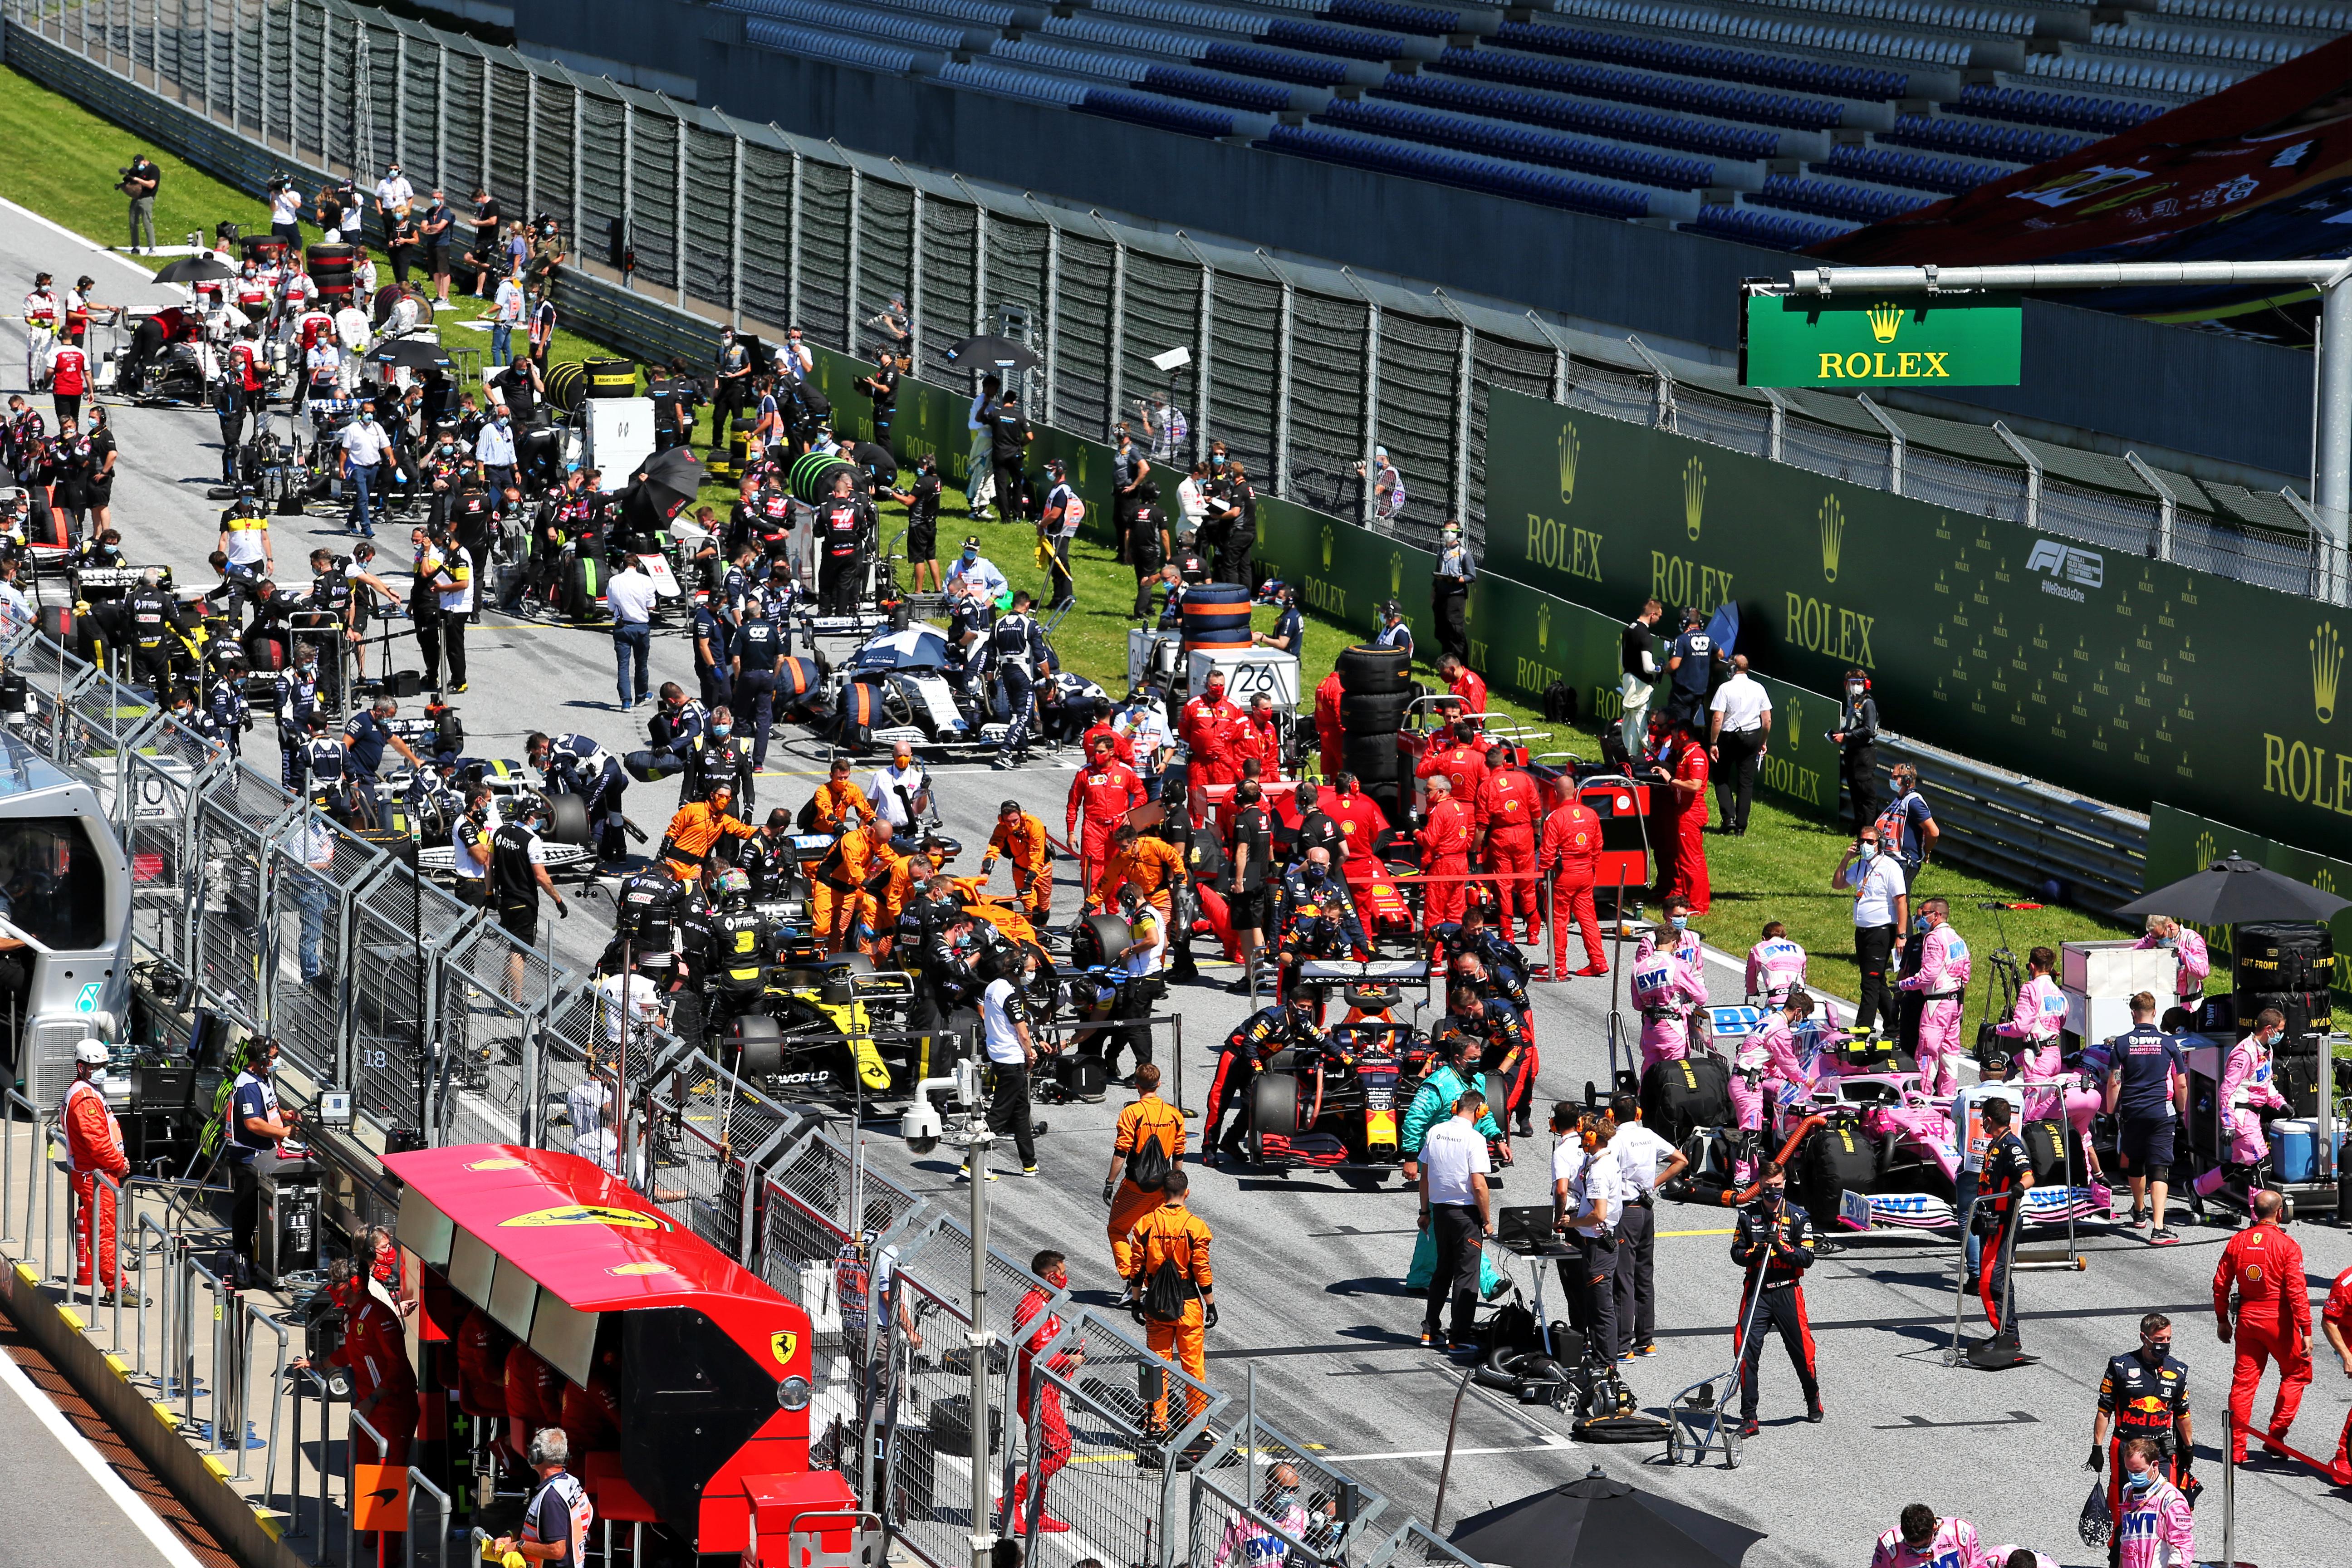 F1 teams on grid mechanics Austrian Grand Prix 2020 Renault Ferrari Red Bull Racing Point